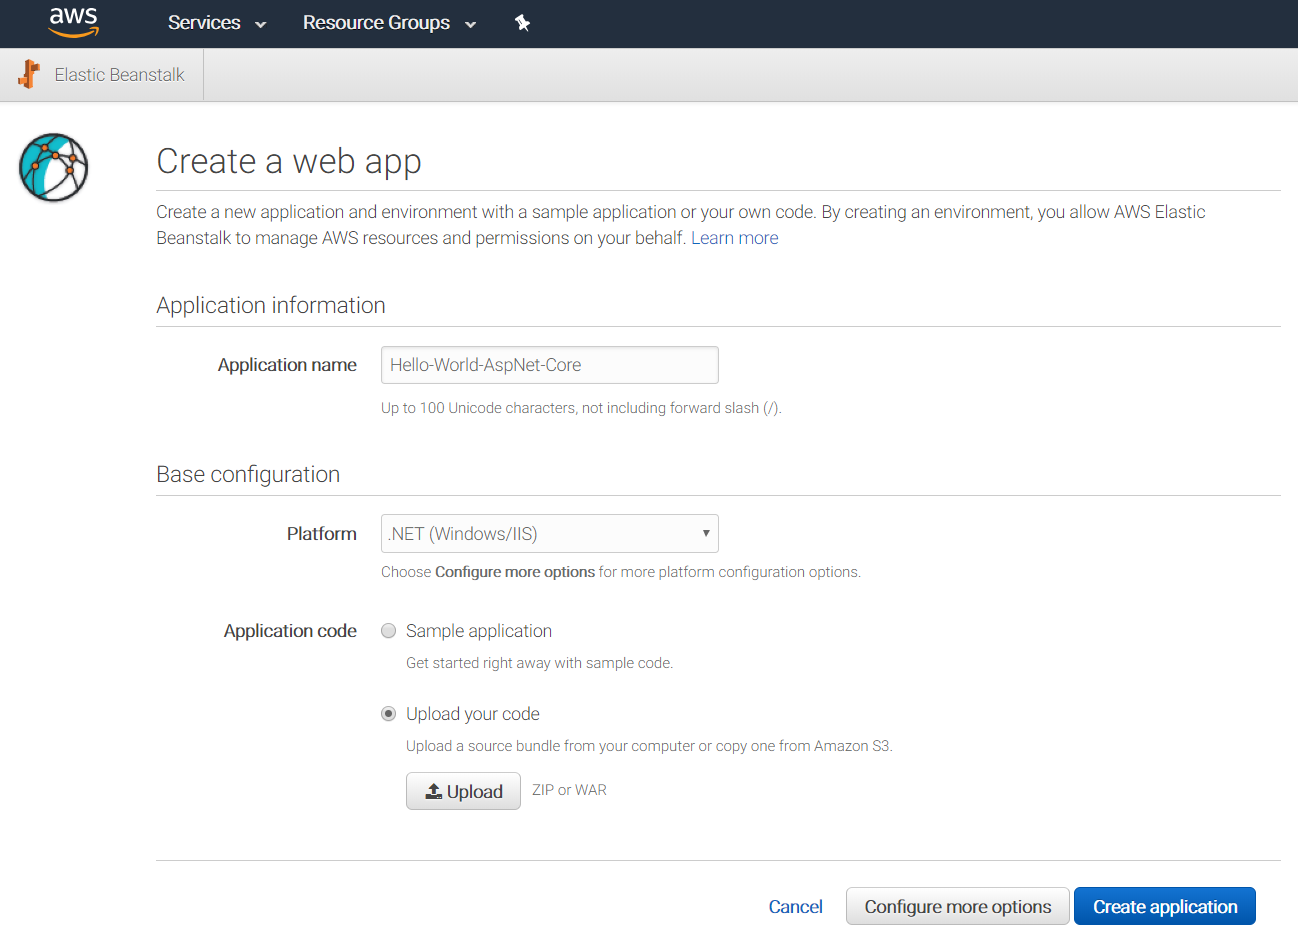 Creating a new AWS Elastic Beanstalk App